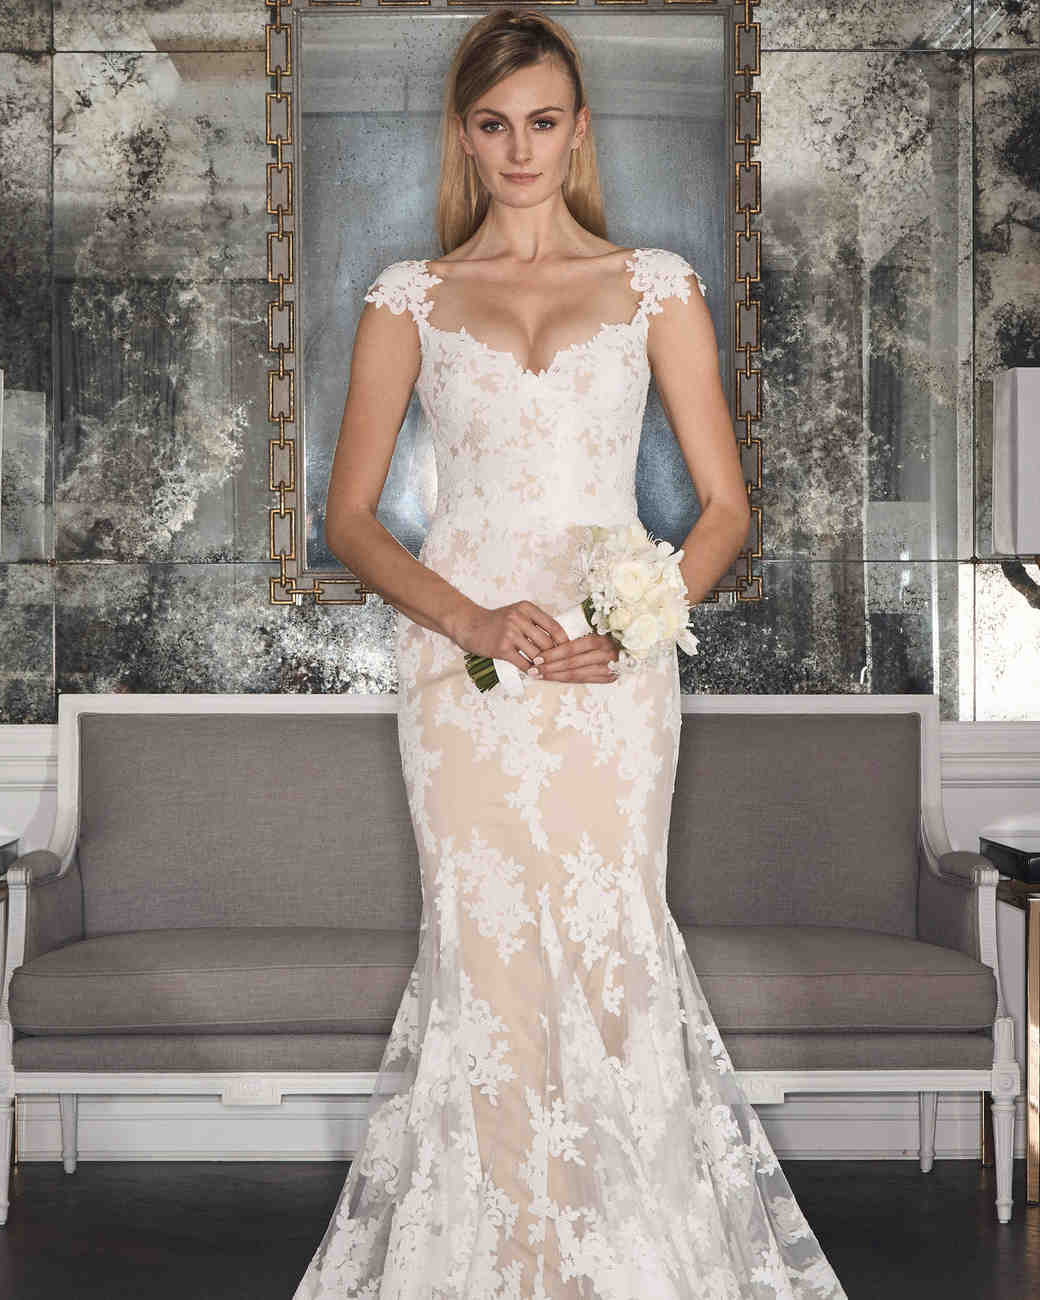 Romona Keveza Wedding Dress 2017 4 Of 13